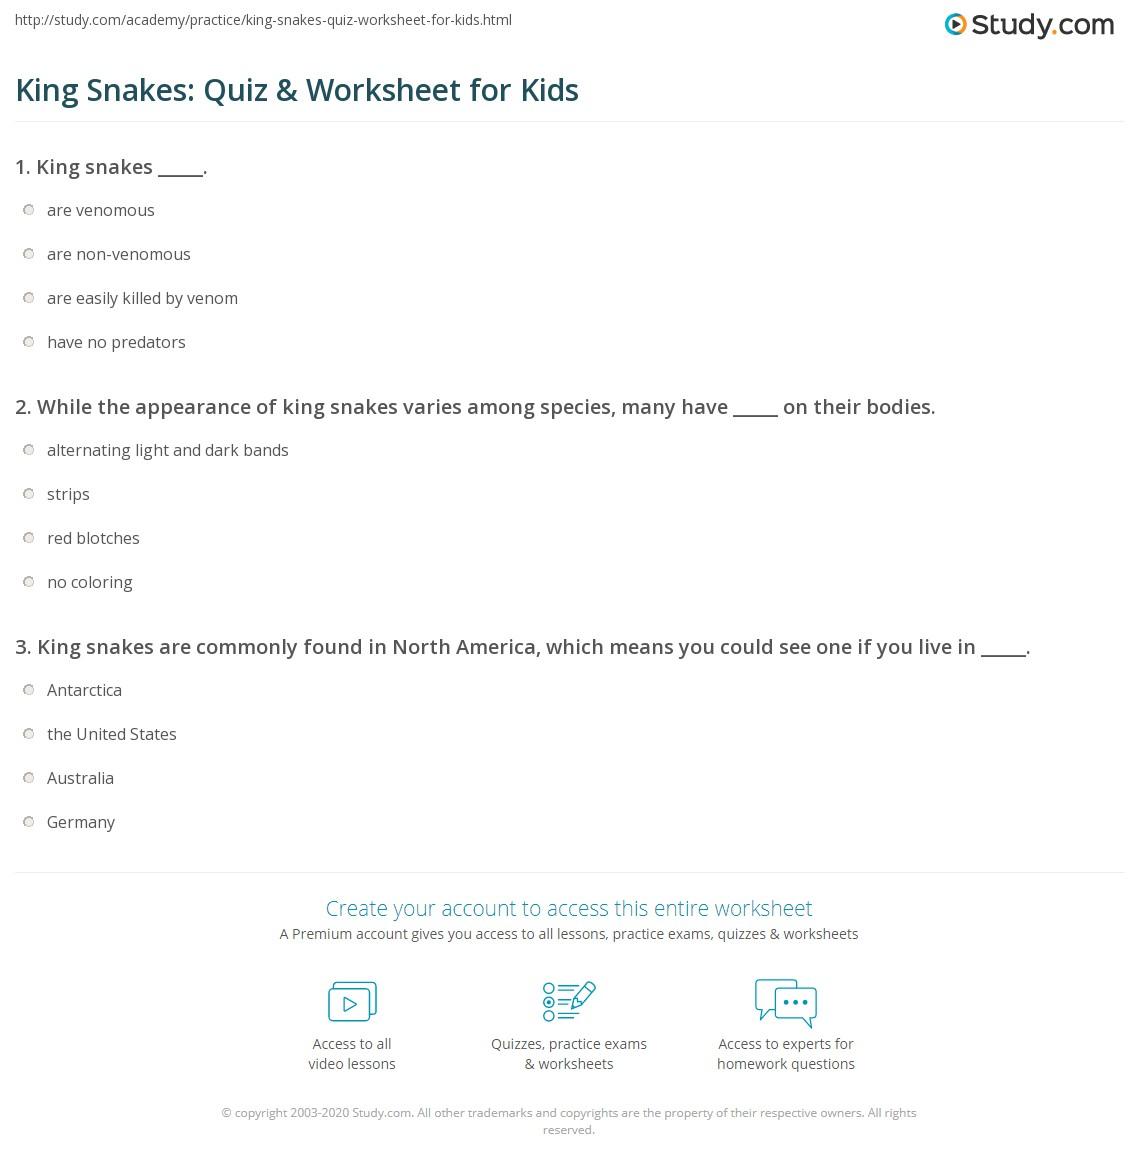 King Snakes Quiz Worksheet For Kids